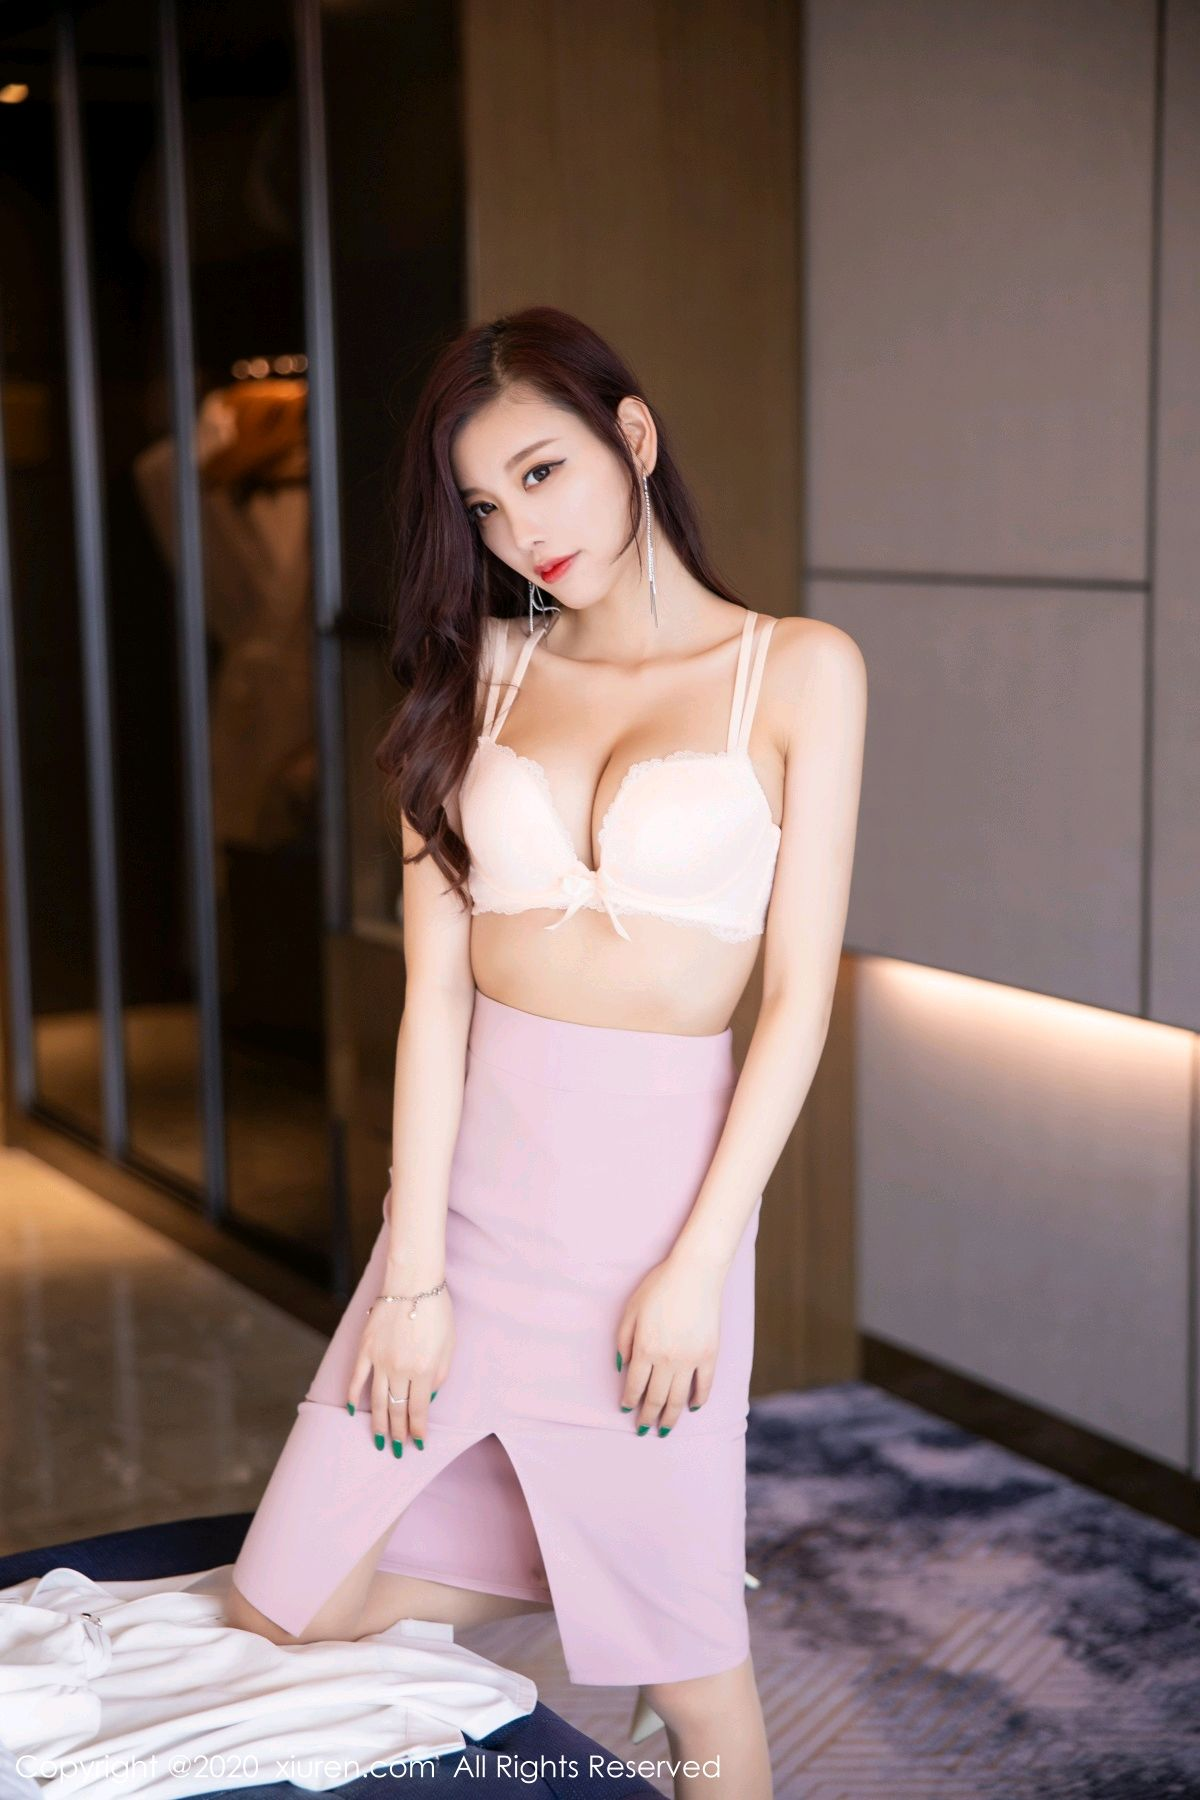 [XiuRen] Vol.2431 Yang Chen Chen 55P, Tall, Underwear, Uniform, Xiuren, Yang Chen Chen